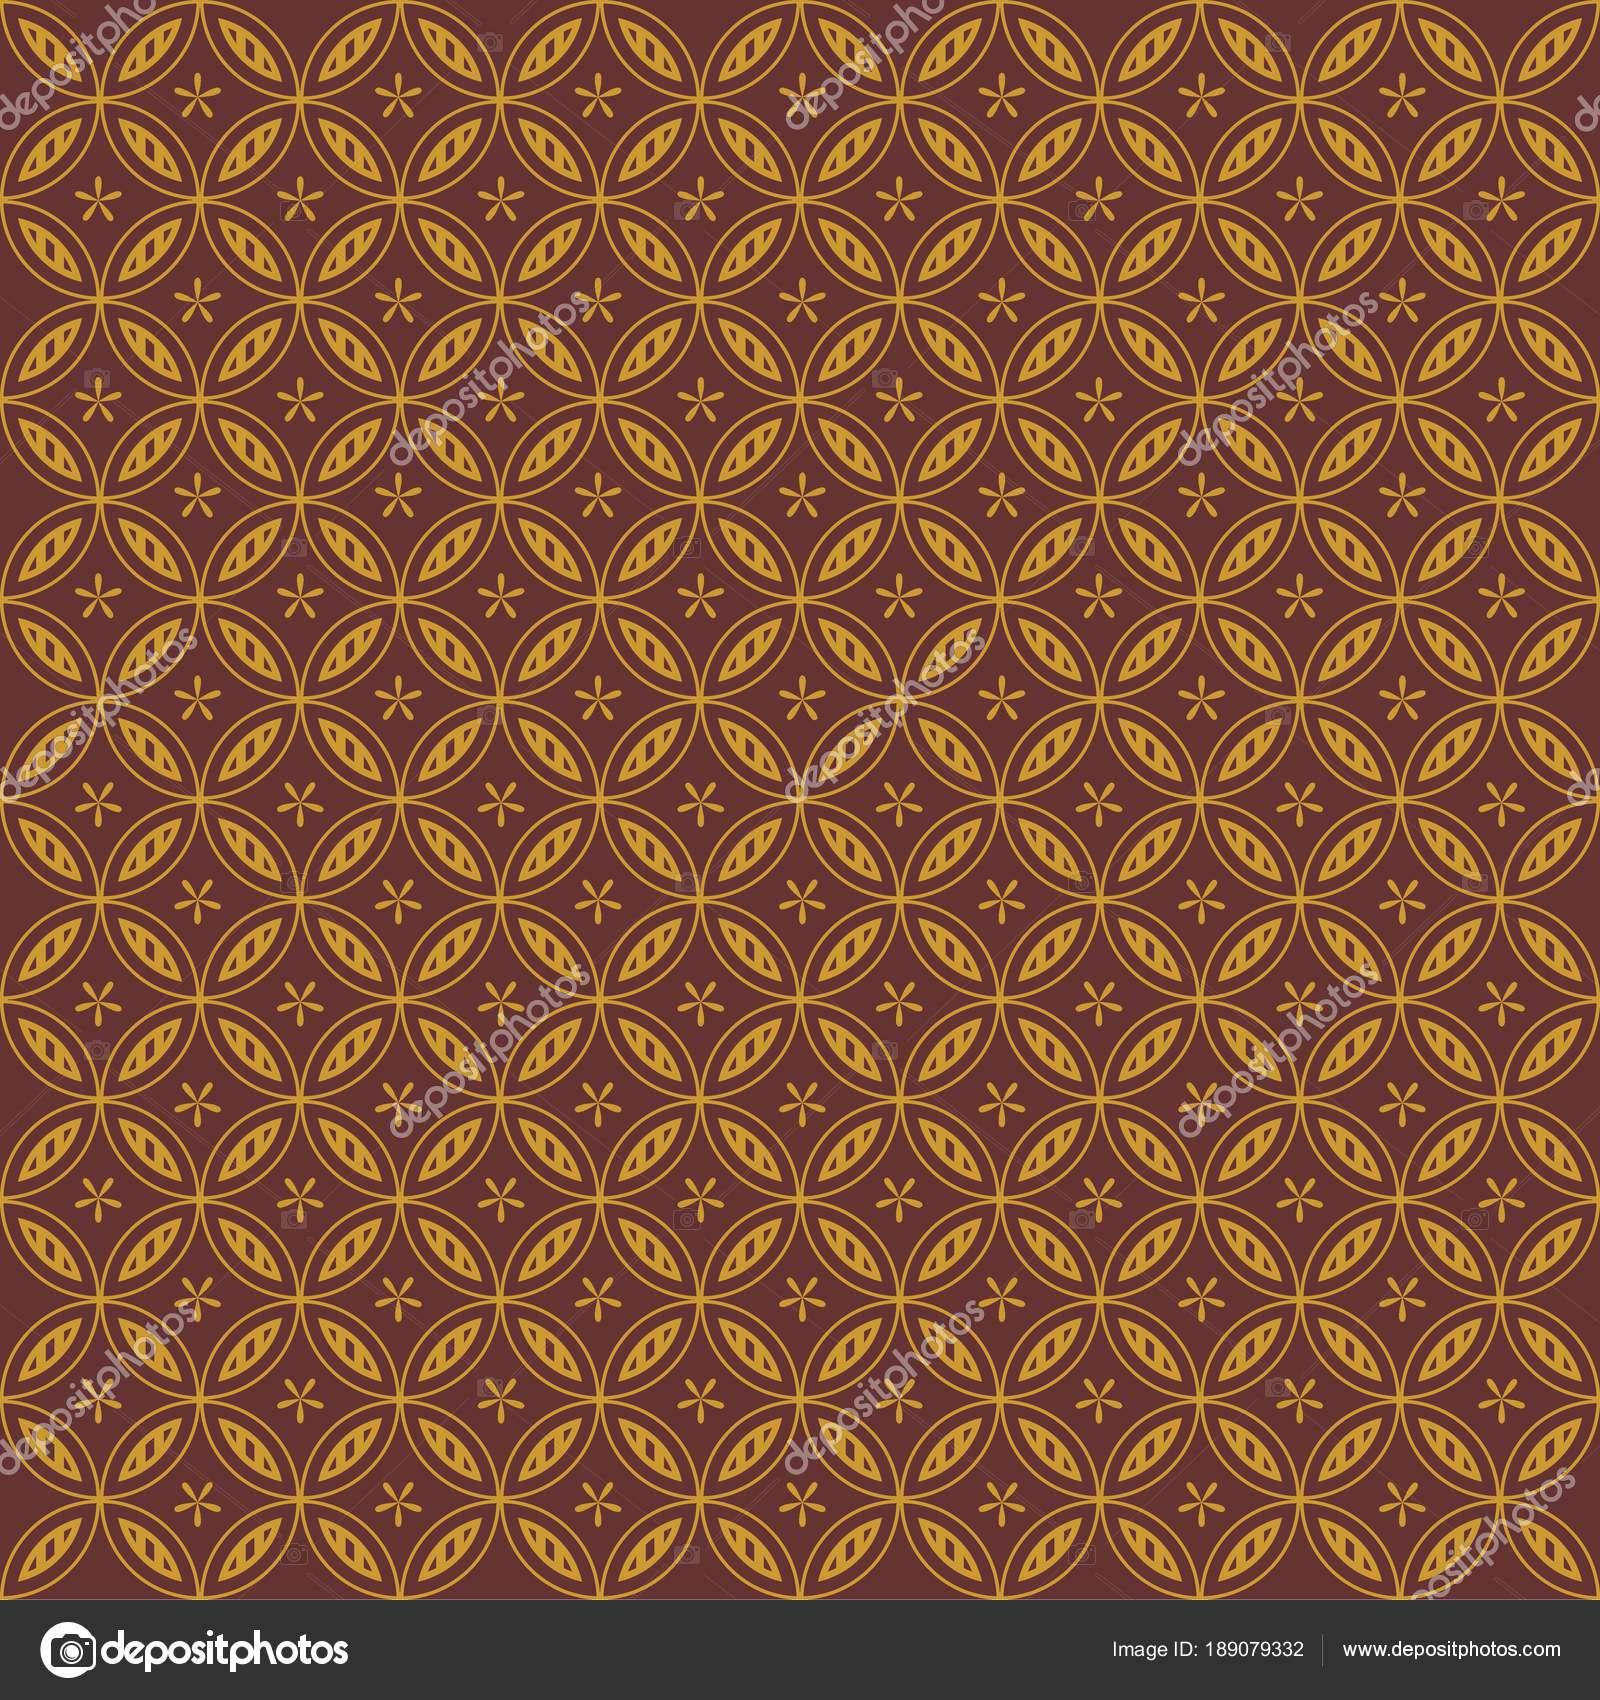 35+ Ide Background Batik Hd Wallpaper